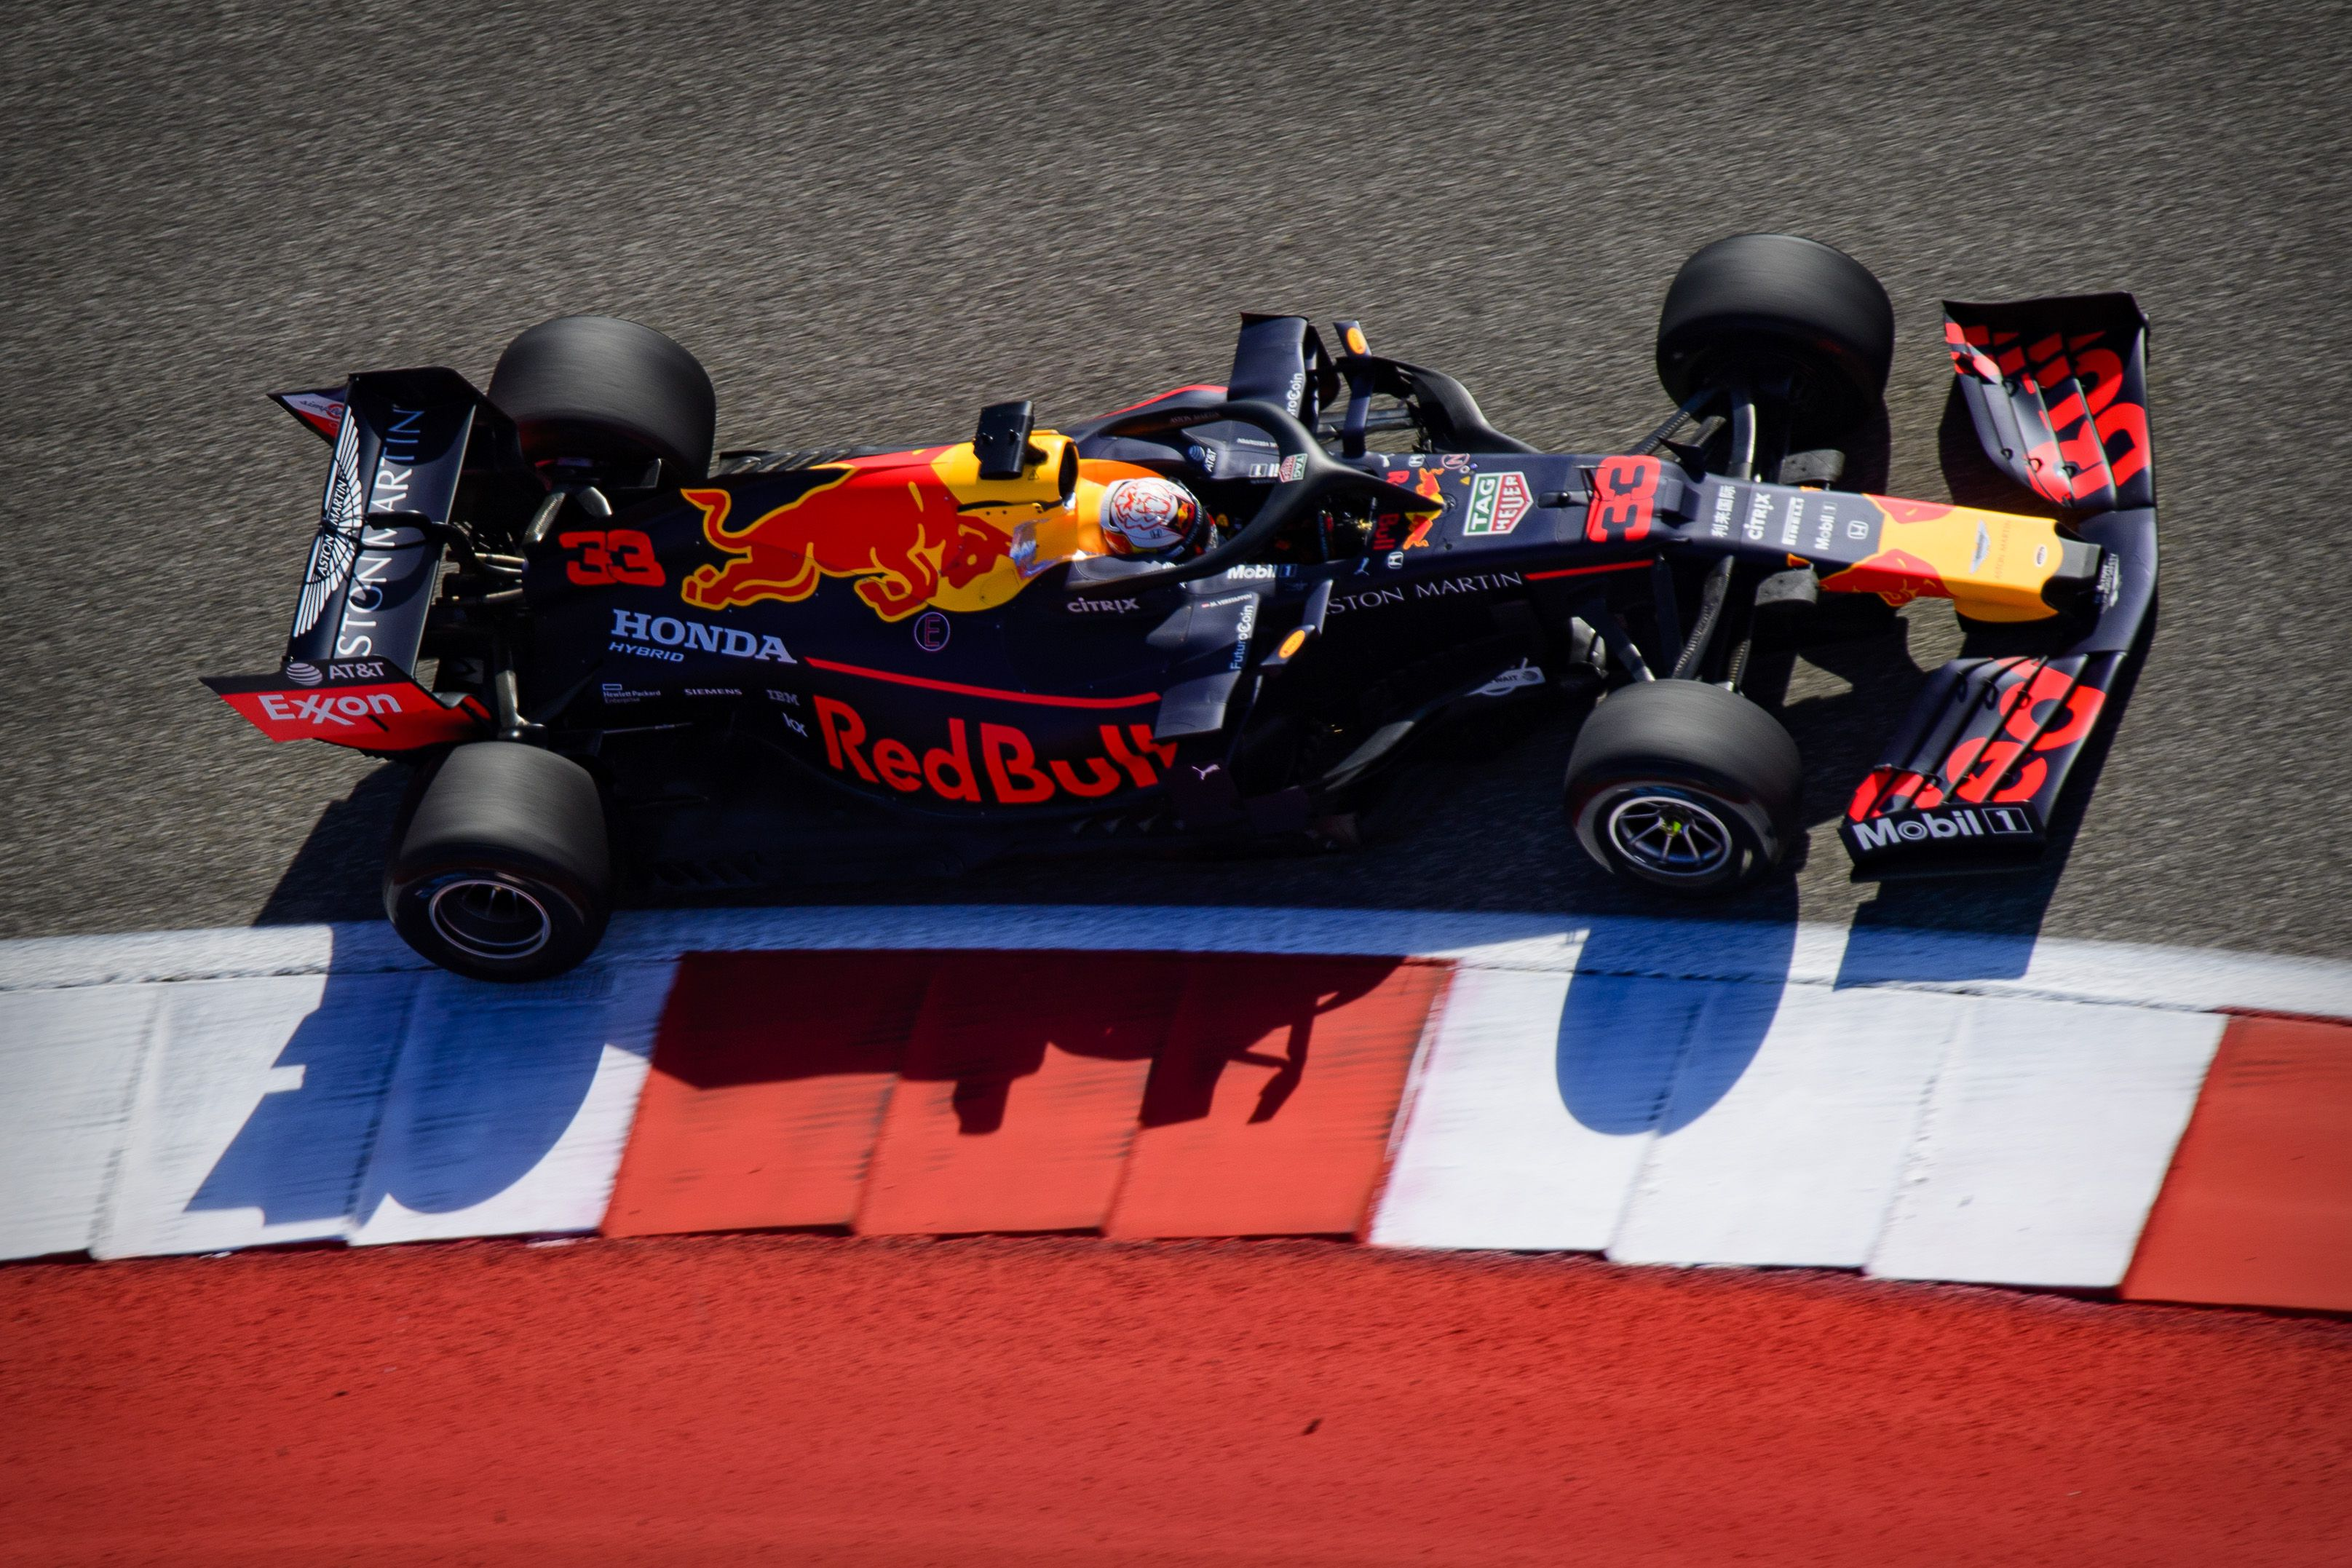 Honda permancerá con Red Bull hasta fines del 2021 (Foto: Reuters)